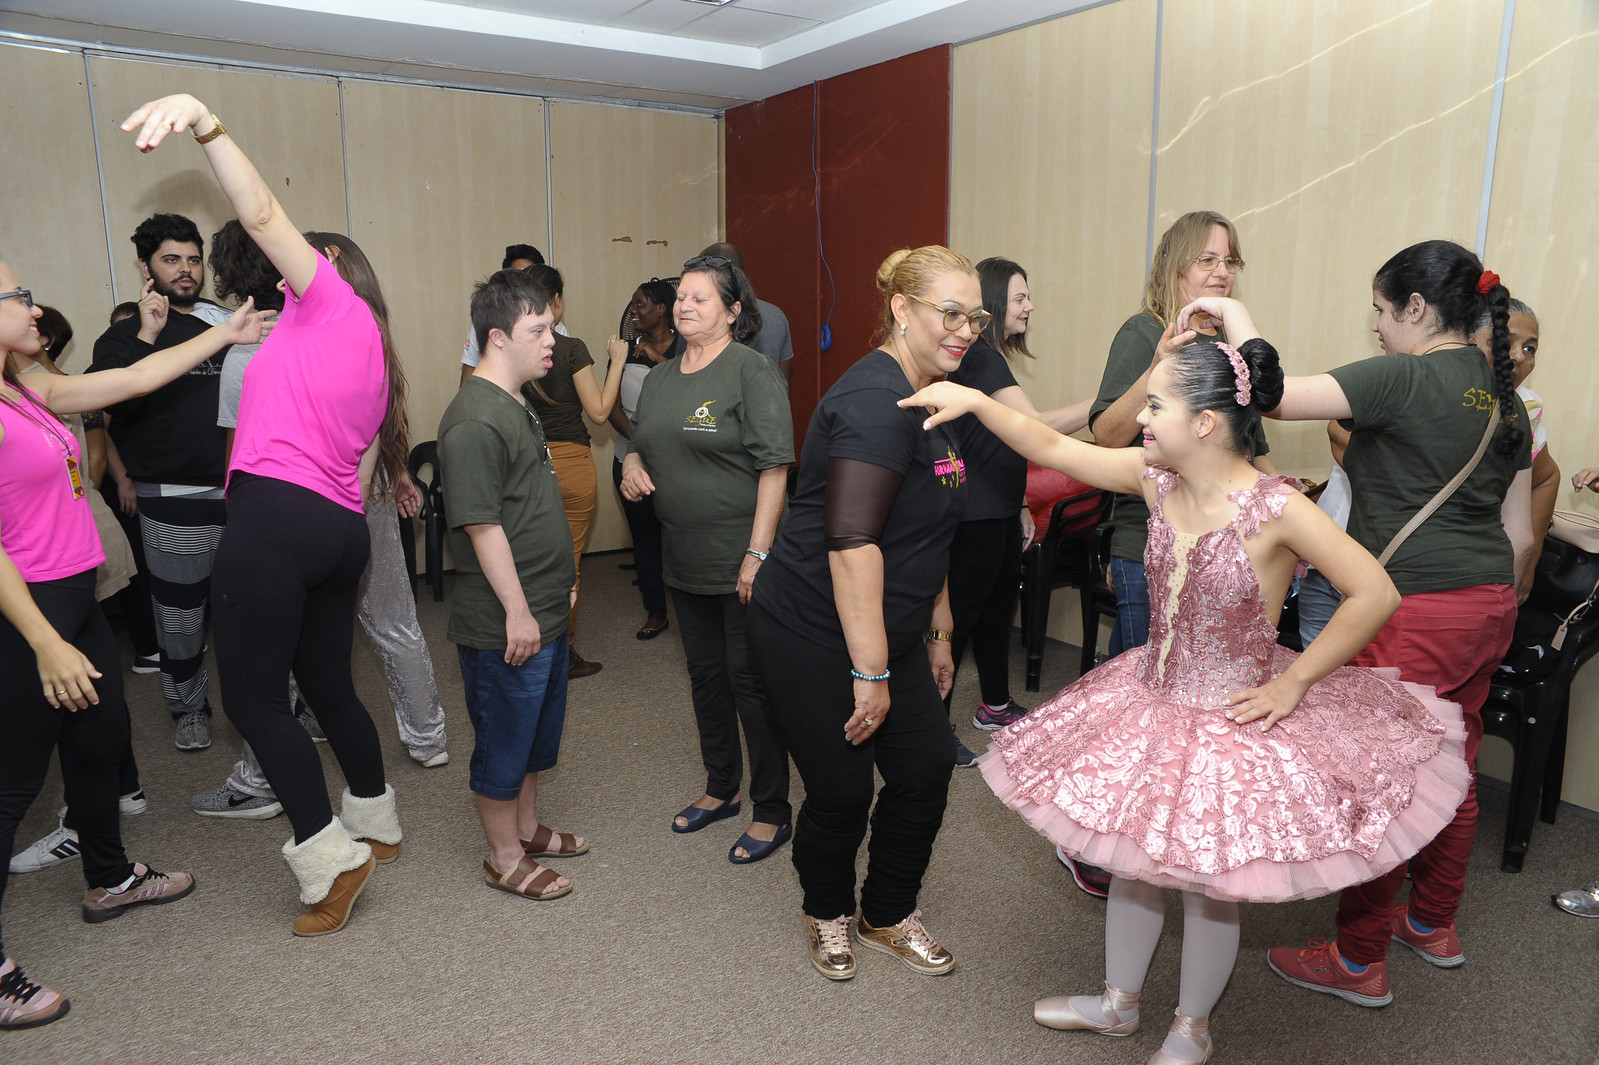 Oficina de Acessibilidade 25.07.2017 - 35º Festival de Dança de Joinville